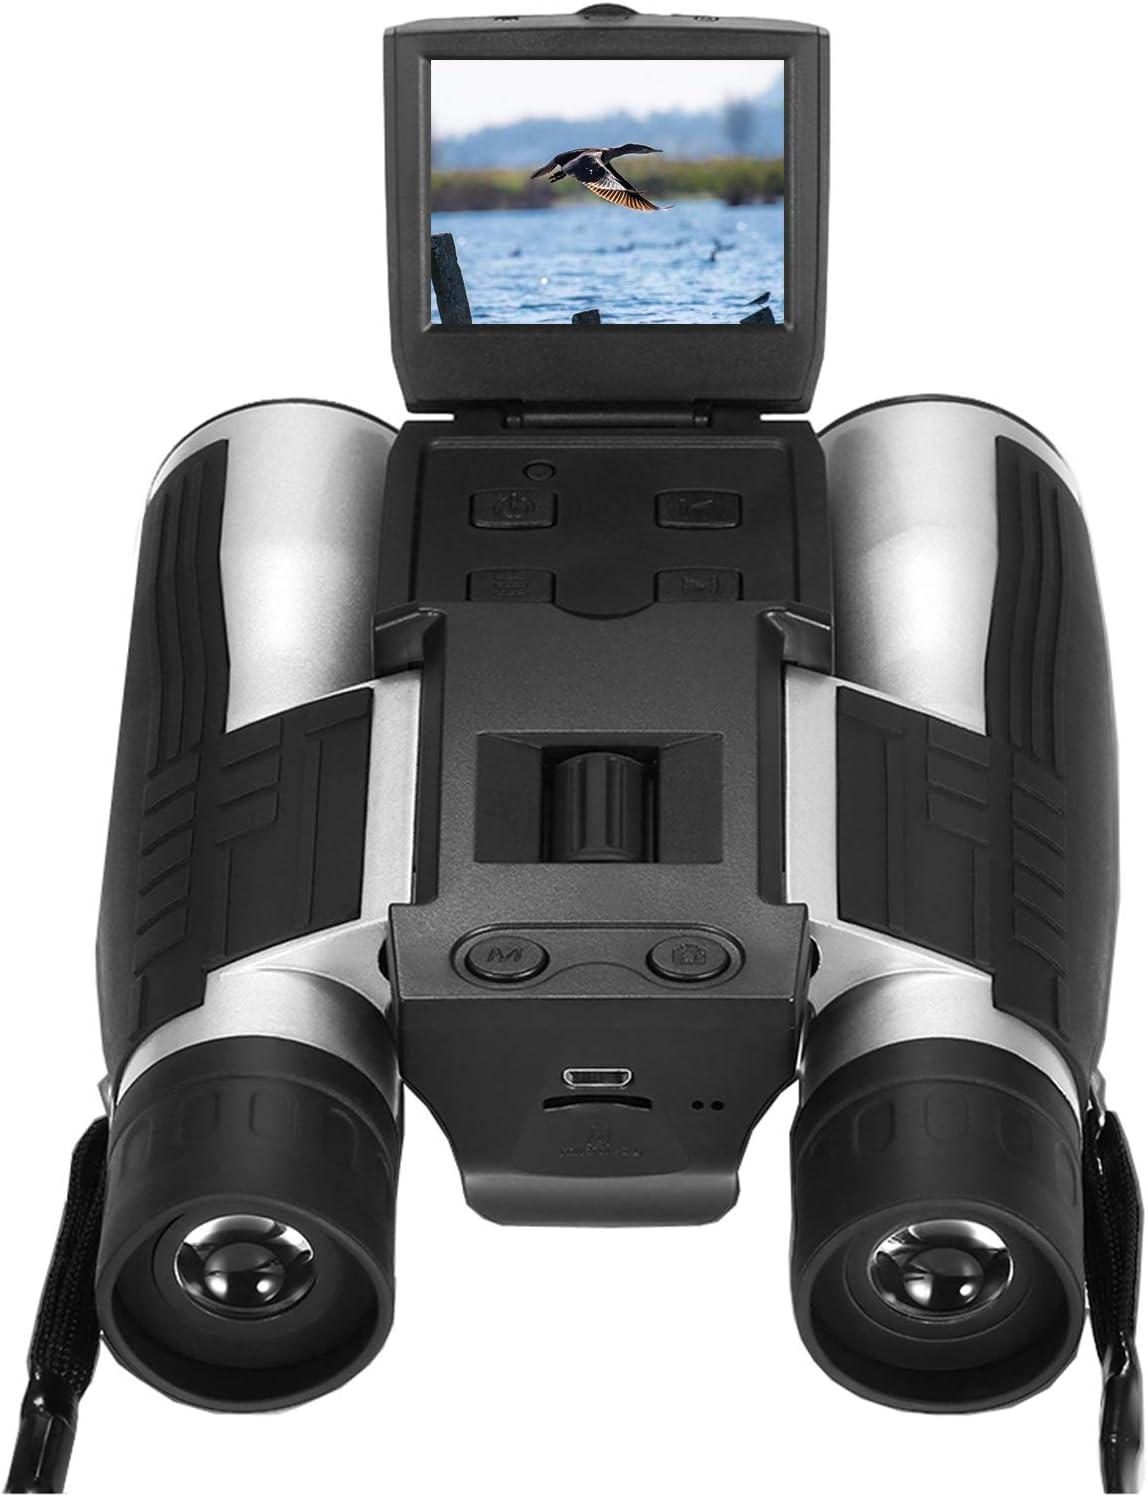 "Digital Camera Binoculars, Eoncore 2"" LCD Display Binoculars for Adults 12x32 5MP Video Photo Recorder for Bird Watching Hunting Sports Games 16GB TF Card : Camera & Photo"